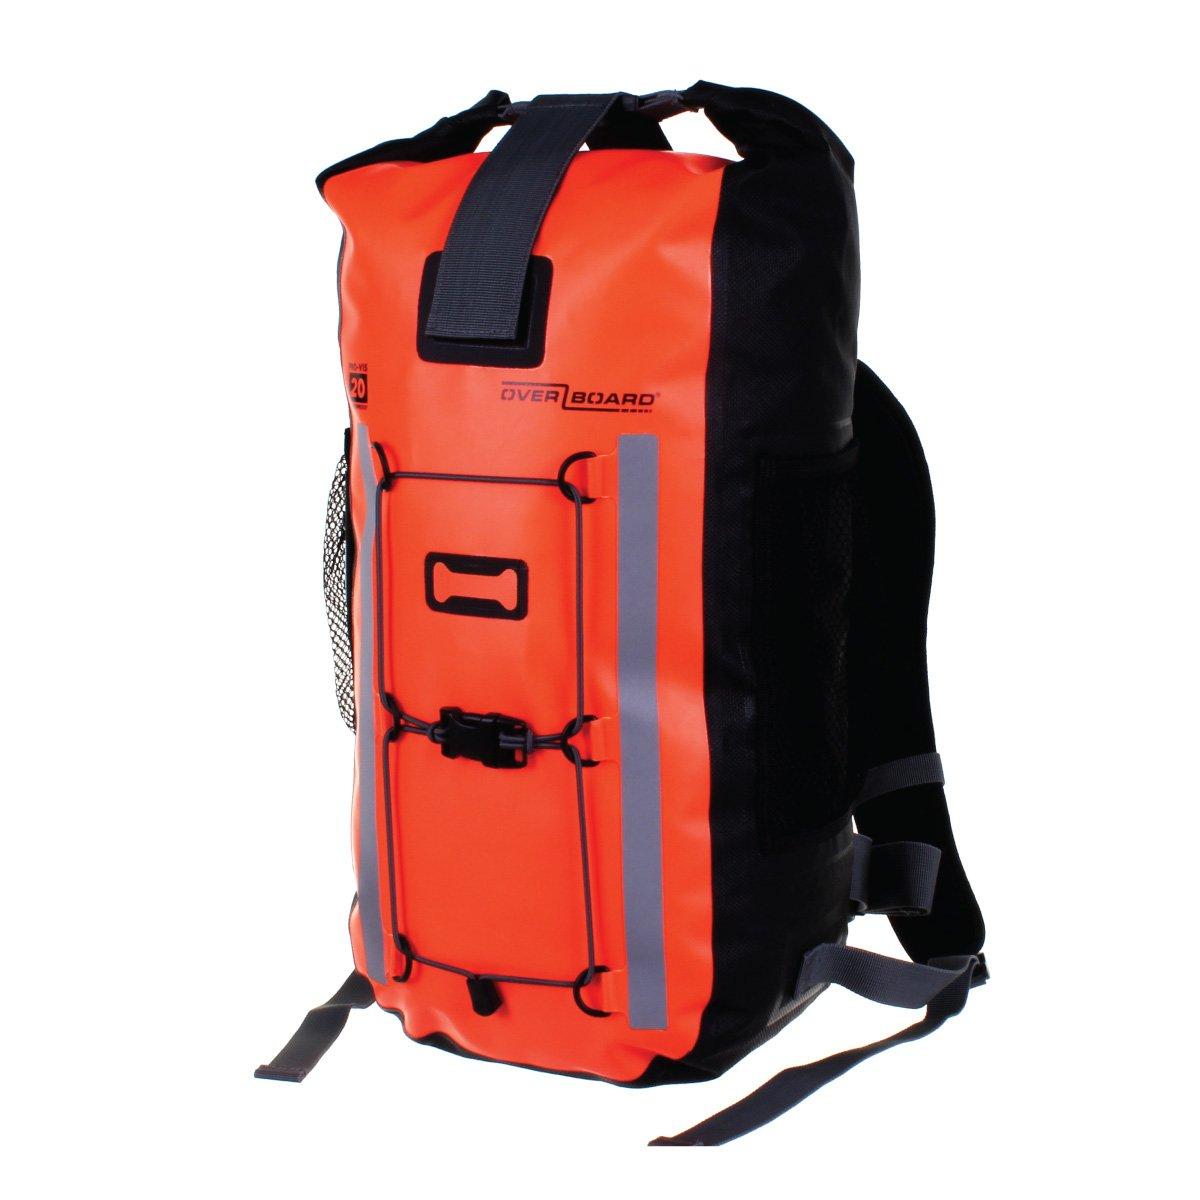 7f43c0694743 Overboard Pro Light Waterproof Commuter Backpack- Fenix Toulouse ...